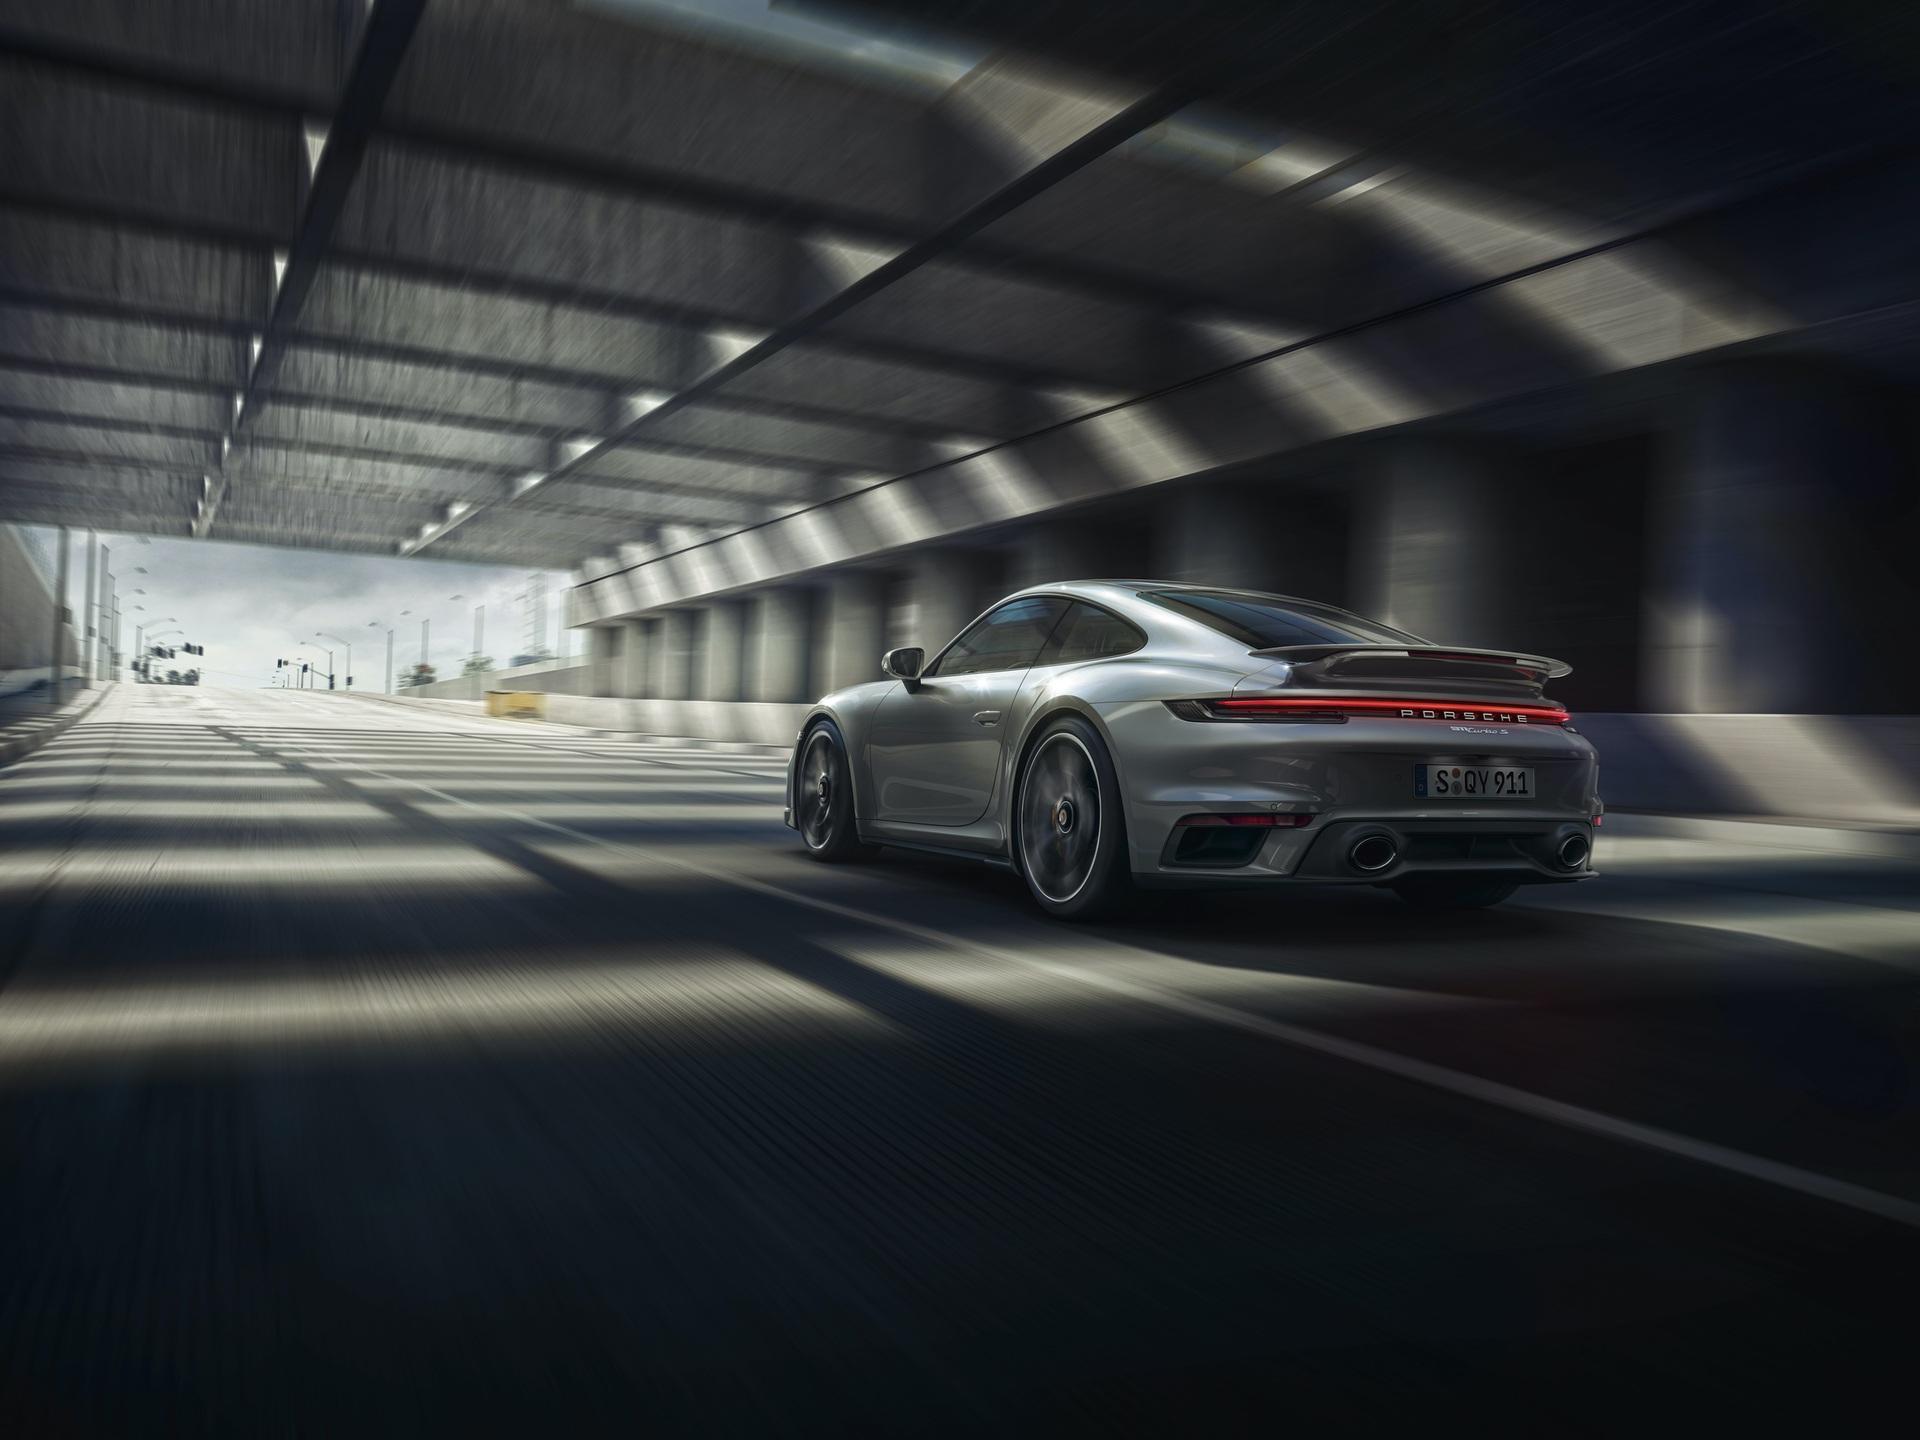 2020_Porsche_911-Turbo_S-aerodynamics_0010